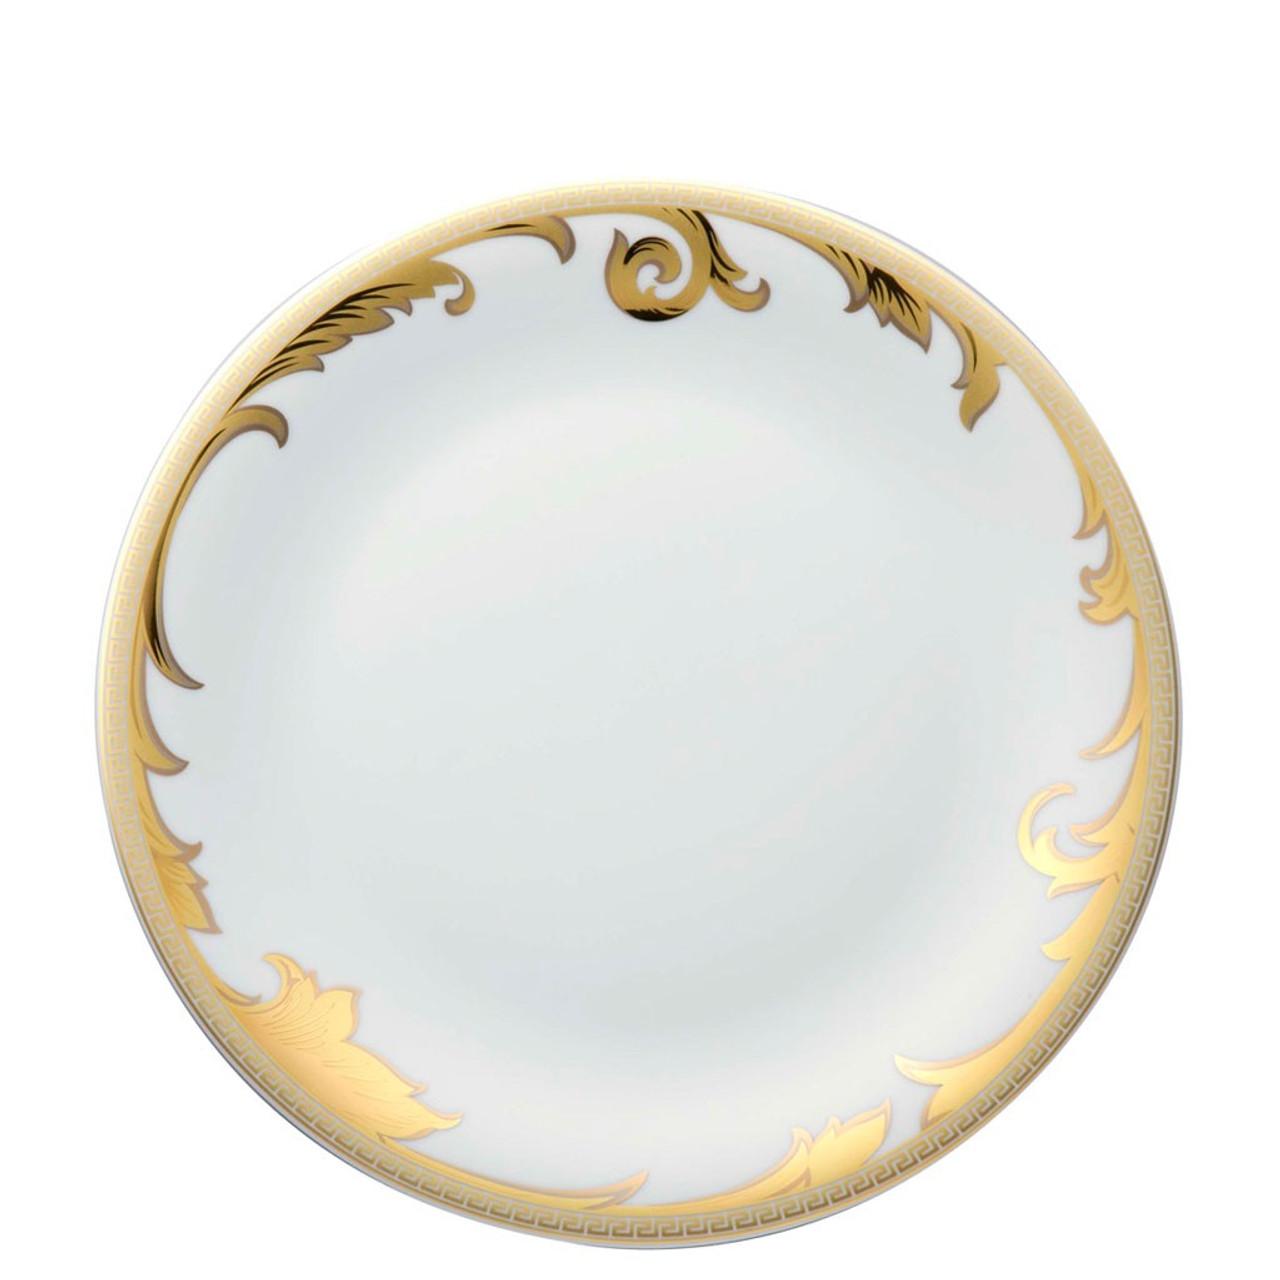 Dinner Plate 11 1/2 inch | Versace Arabesque Gold  sc 1 st  Rosenthal & Dinner Plate 11 1/2 inch | Arabesque Gold| Rosenthal Shop